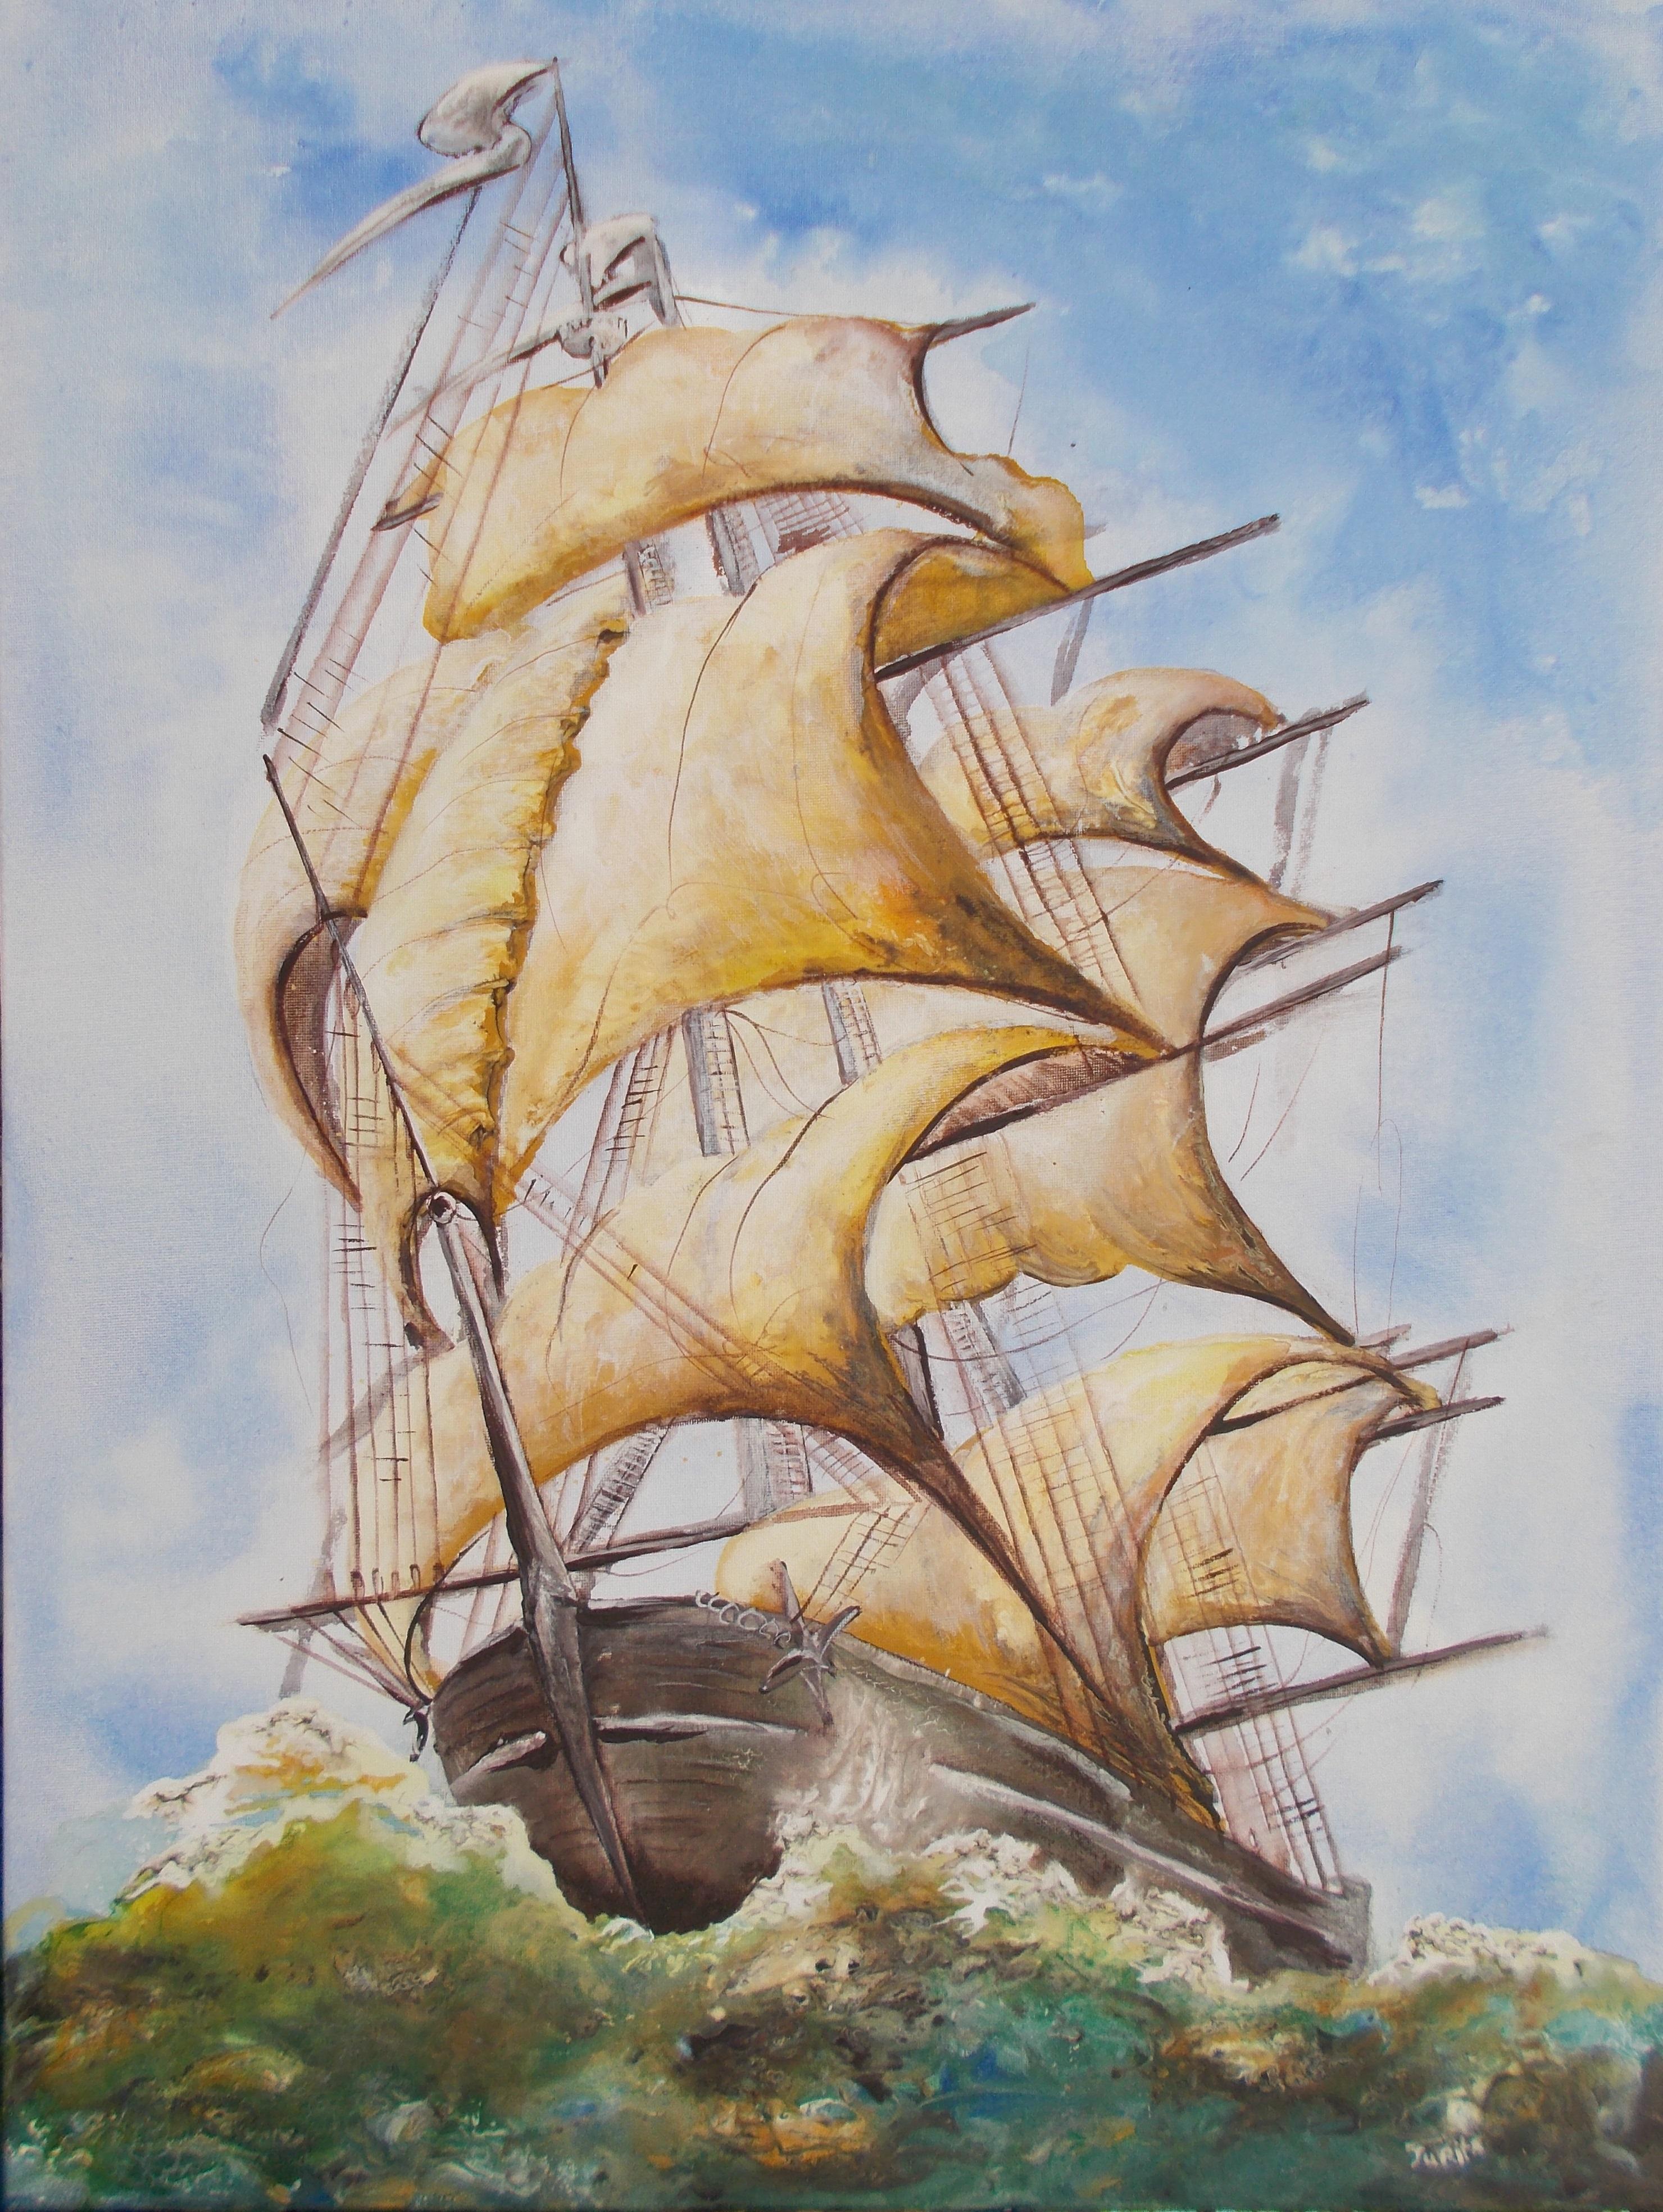 My child's dream sailboat on the waves-jurita-acrylic on canvas-80x60cm-26 april 2020© (2)